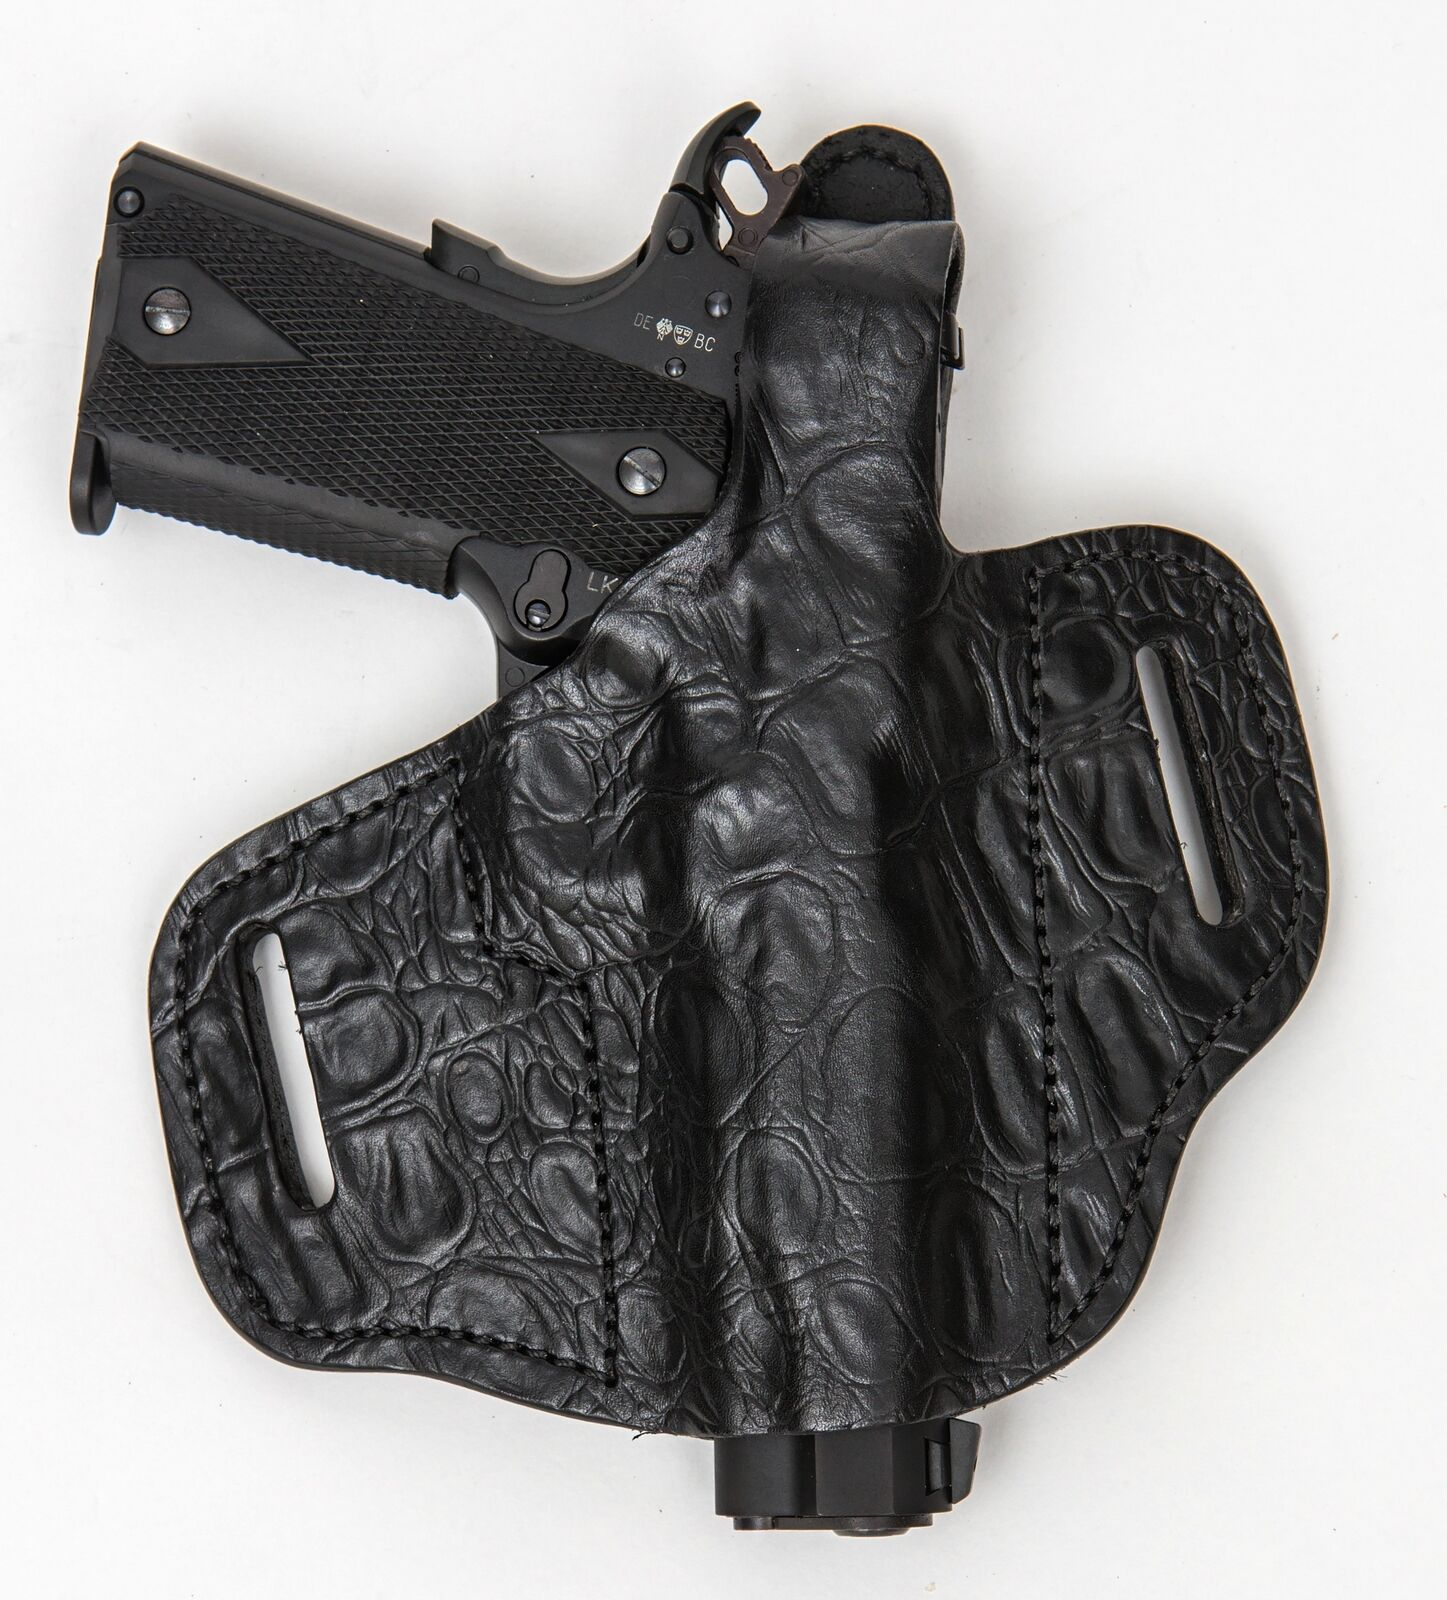 On Duty Conceal RH LH OWB Leder Gun Holster For Taurus Curve .380